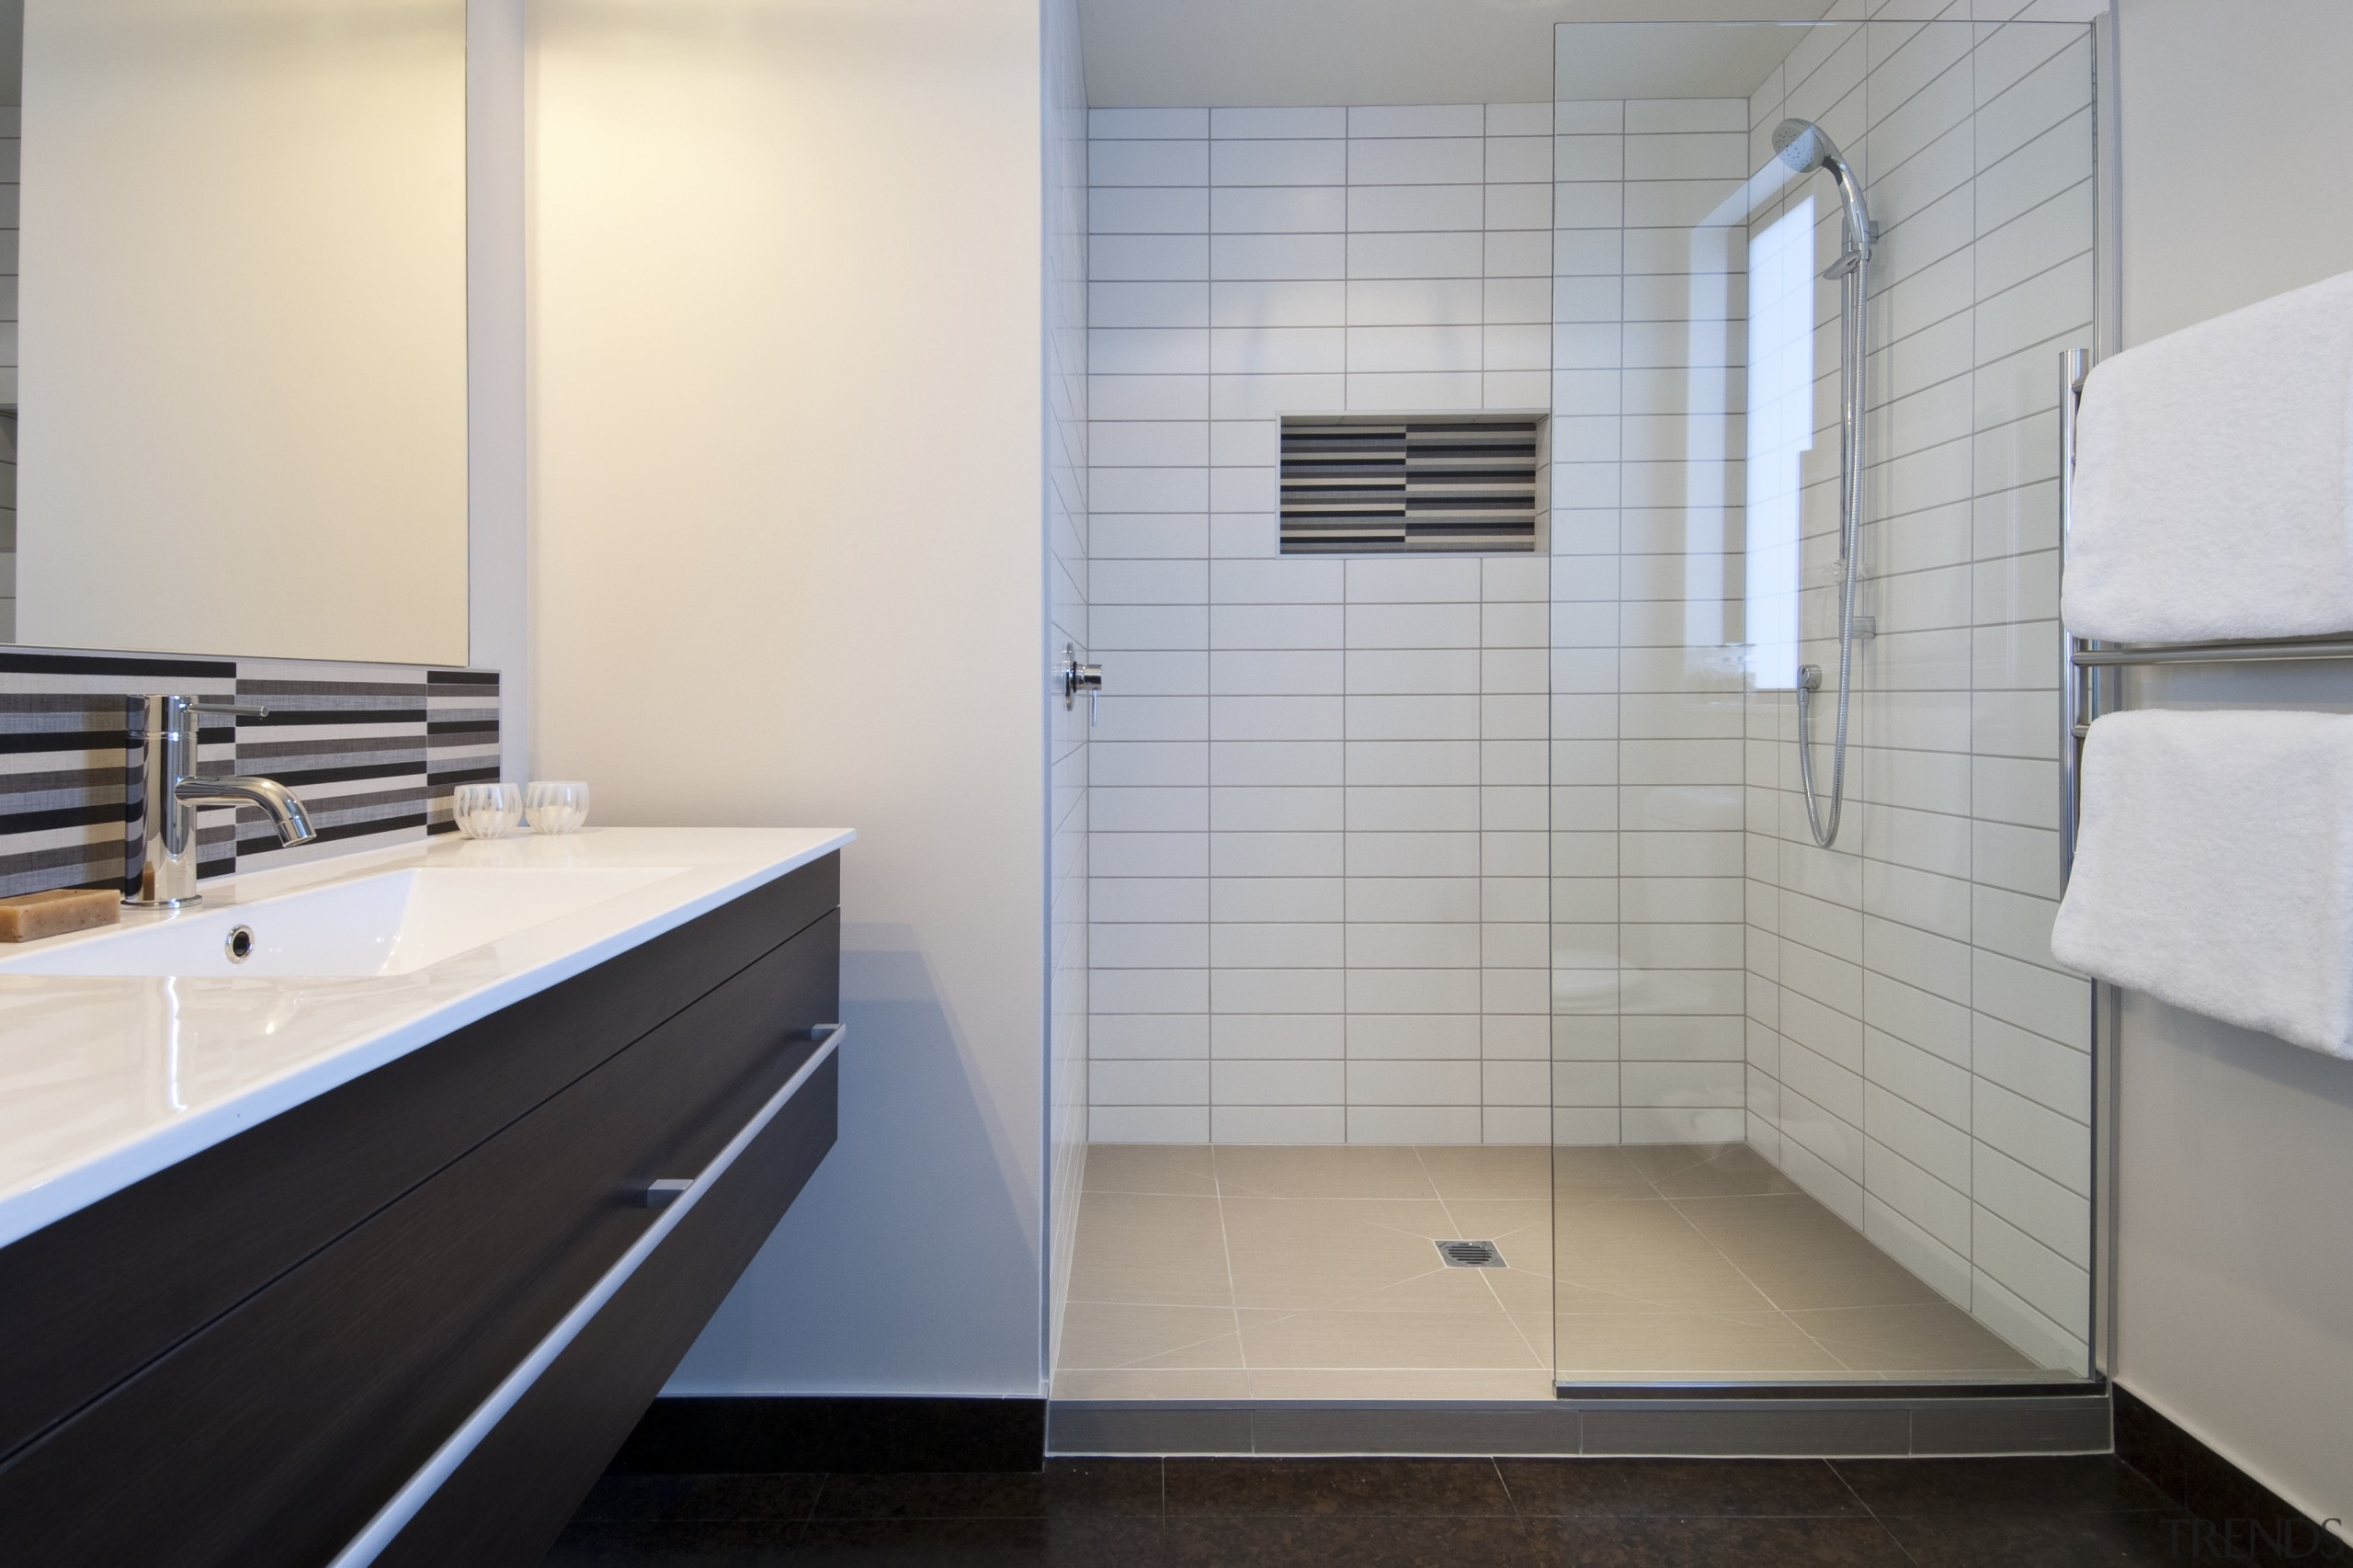 This Upper Hutt Show home was designed and architecture, bathroom, floor, flooring, interior design, plumbing fixture, room, sink, tile, gray